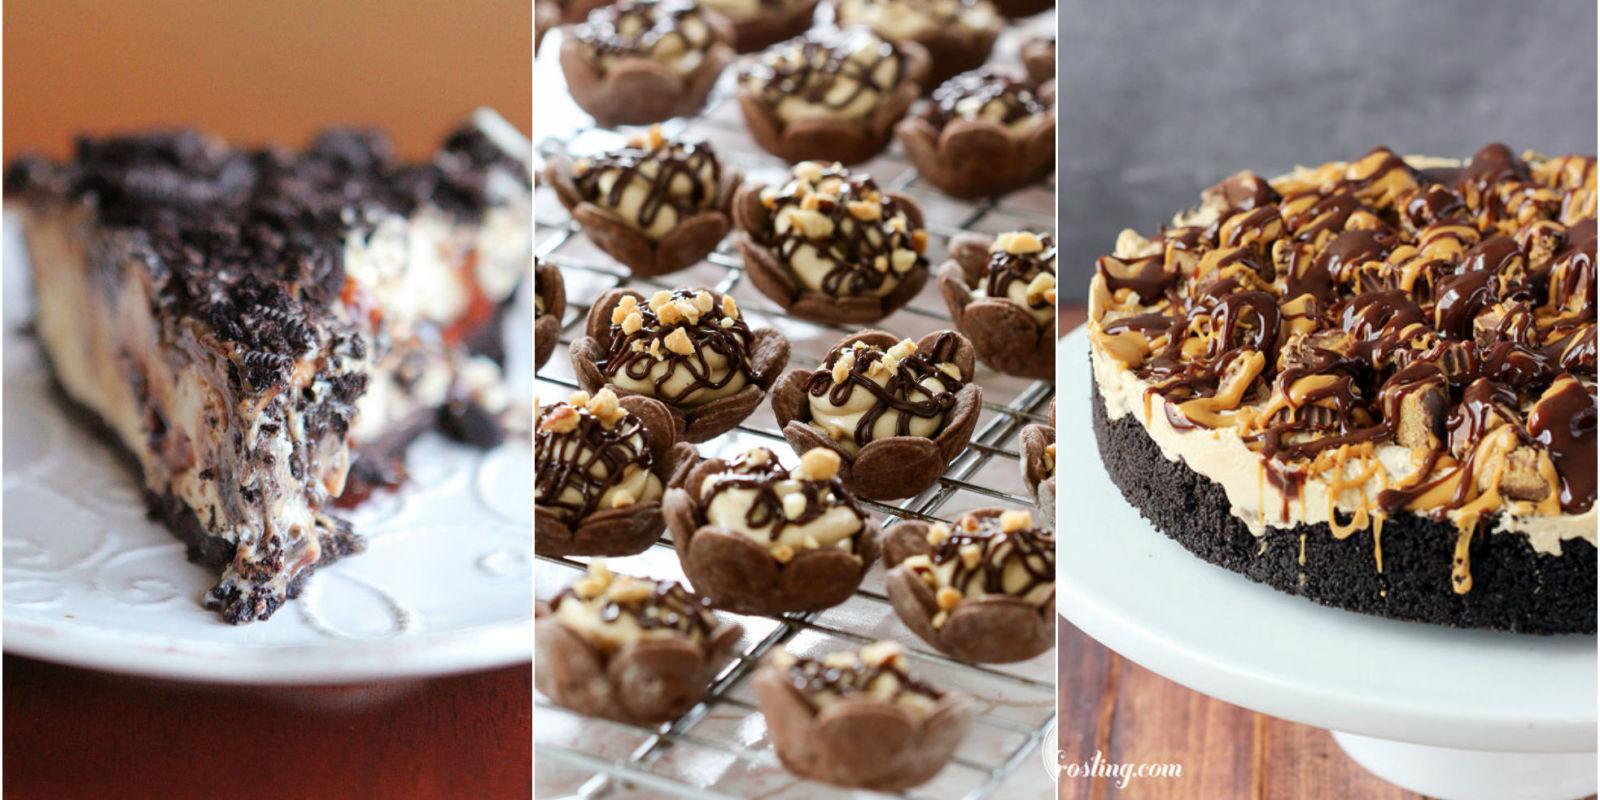 Twists on Peanut Butter Pie - Peanut Butter Pie Recipes